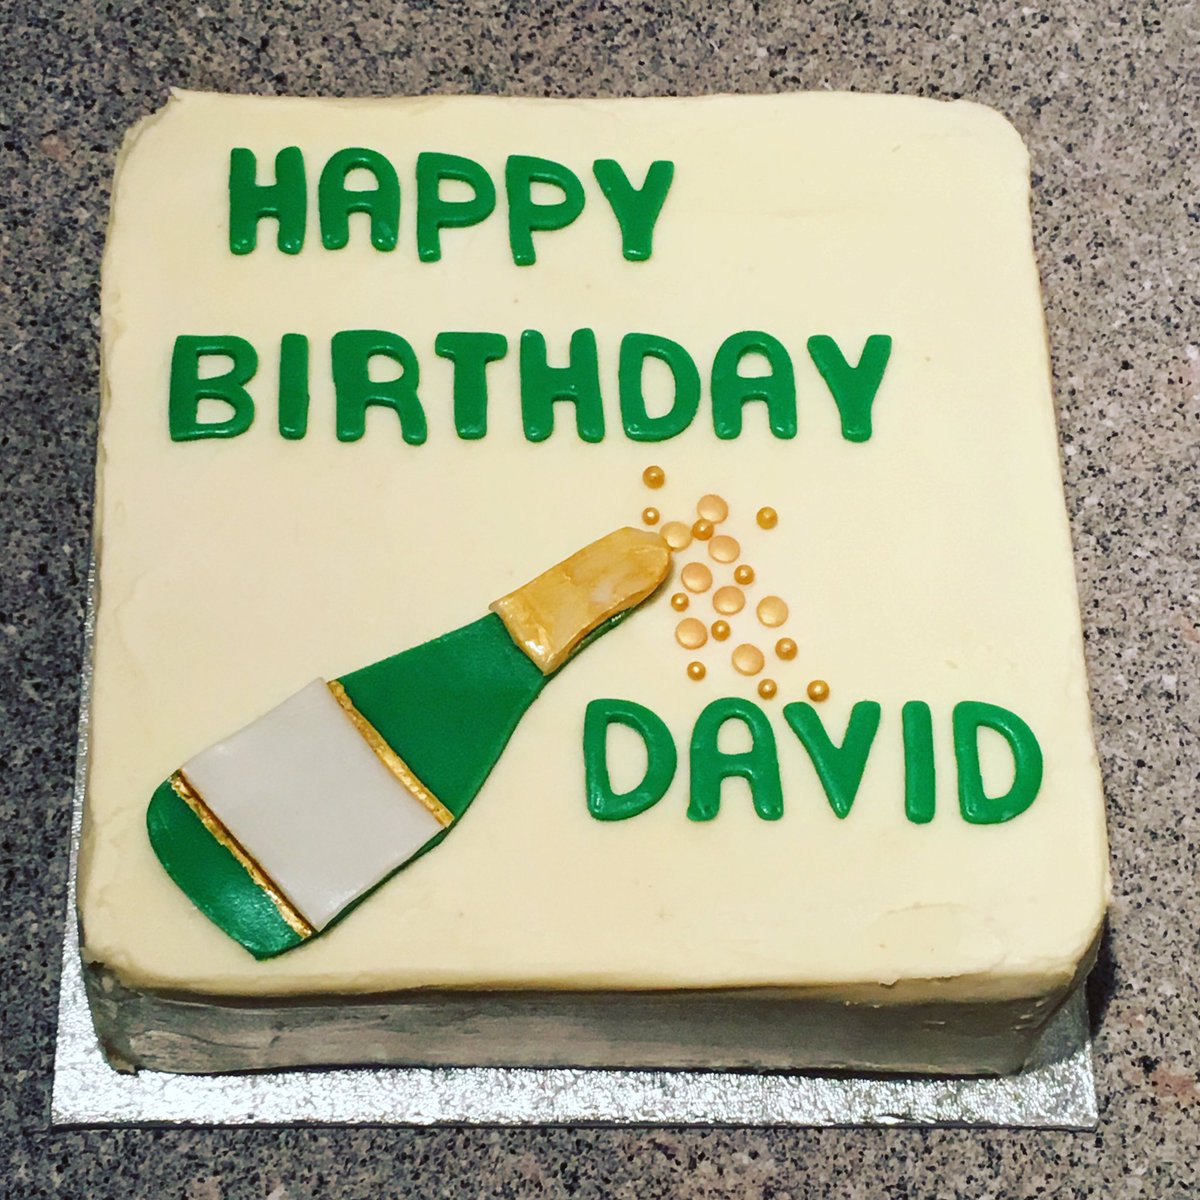 Paris Aitken Smith On Twitter Last Nights Cake For David The